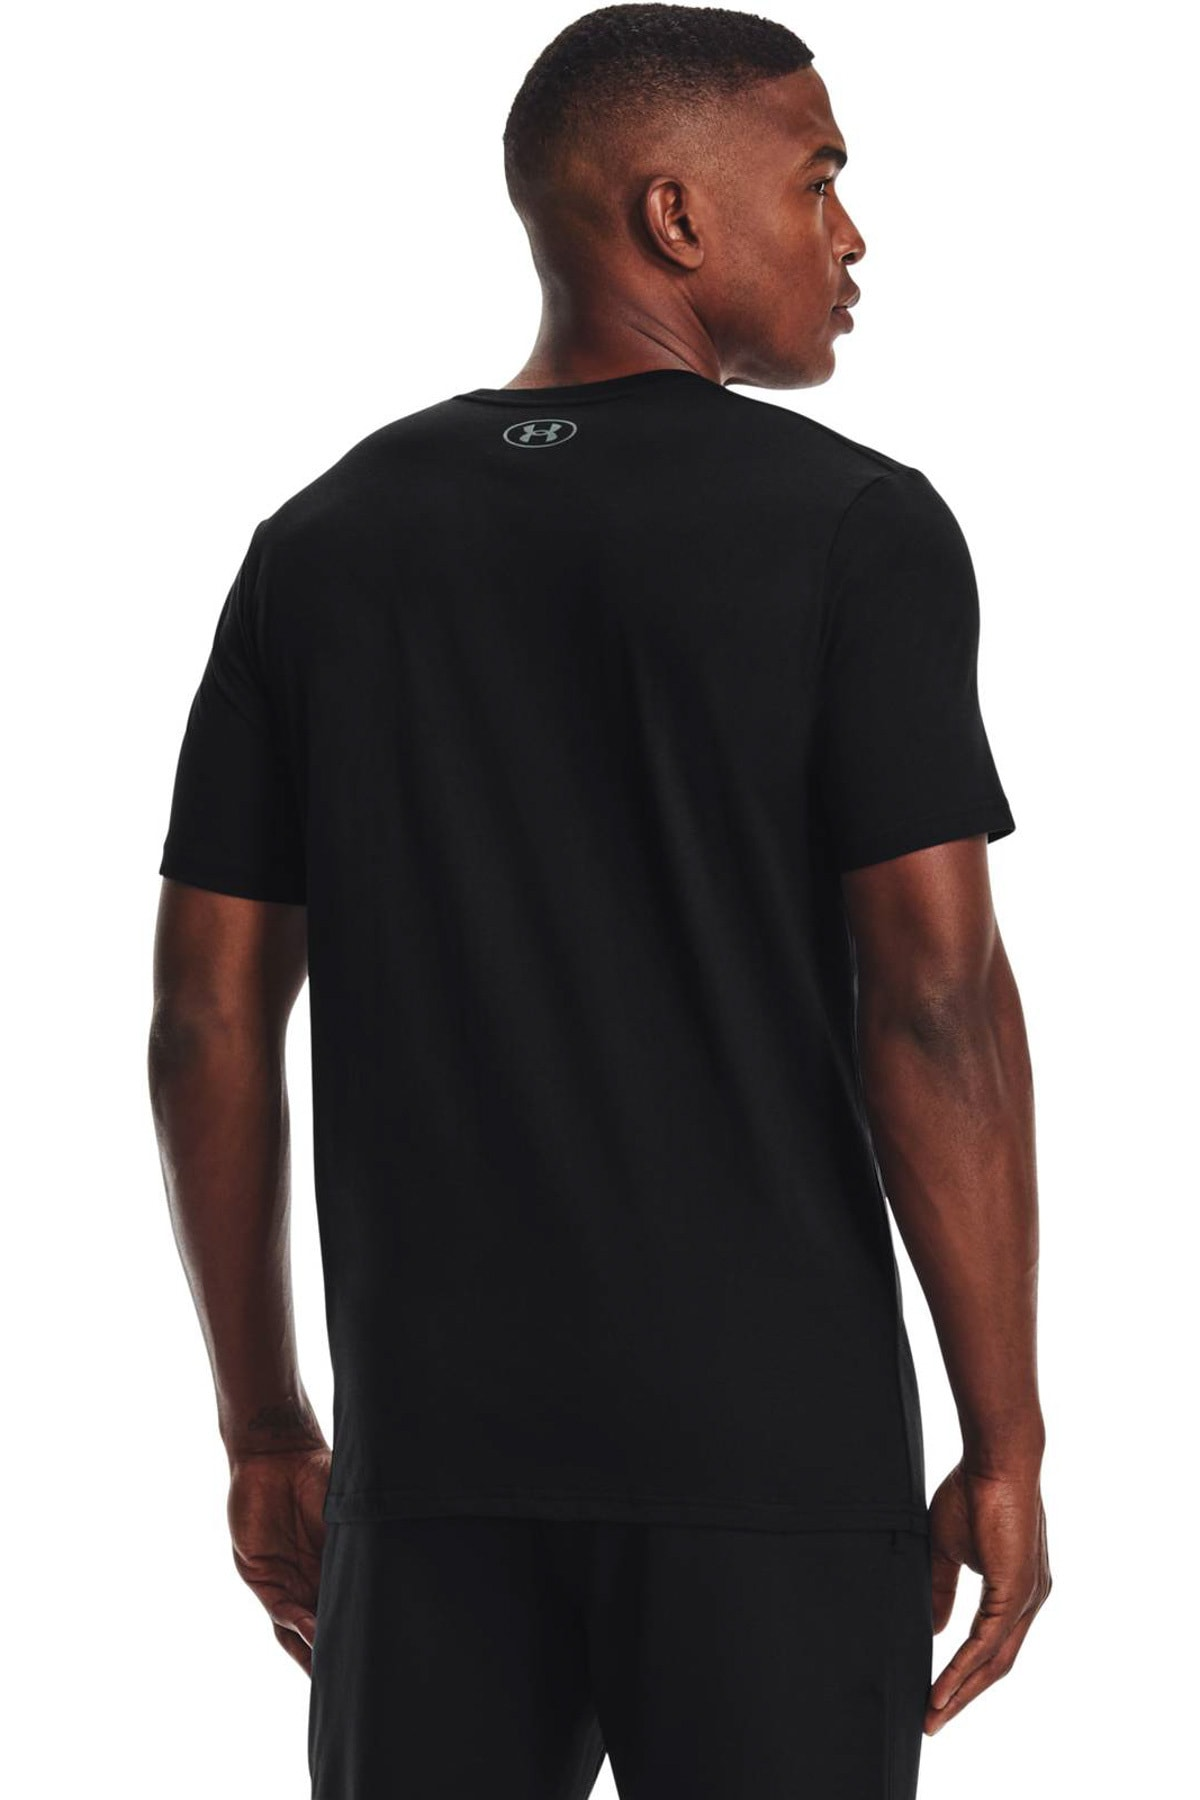 Under Armour Erkek Spor T-Shirt - UA HOOPS ICON TEE - 1361920-001 2